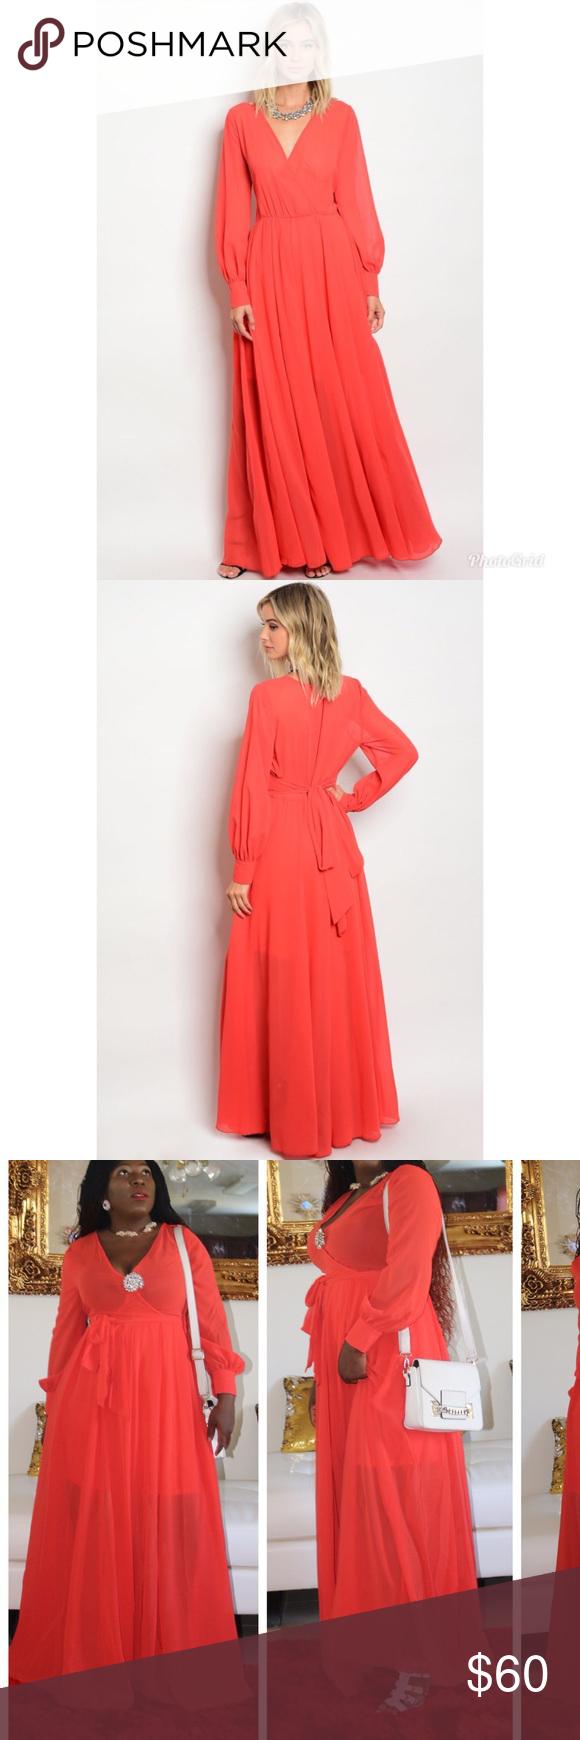 Long chiffon maxi dress boutique chiffon maxi and maxi dresses